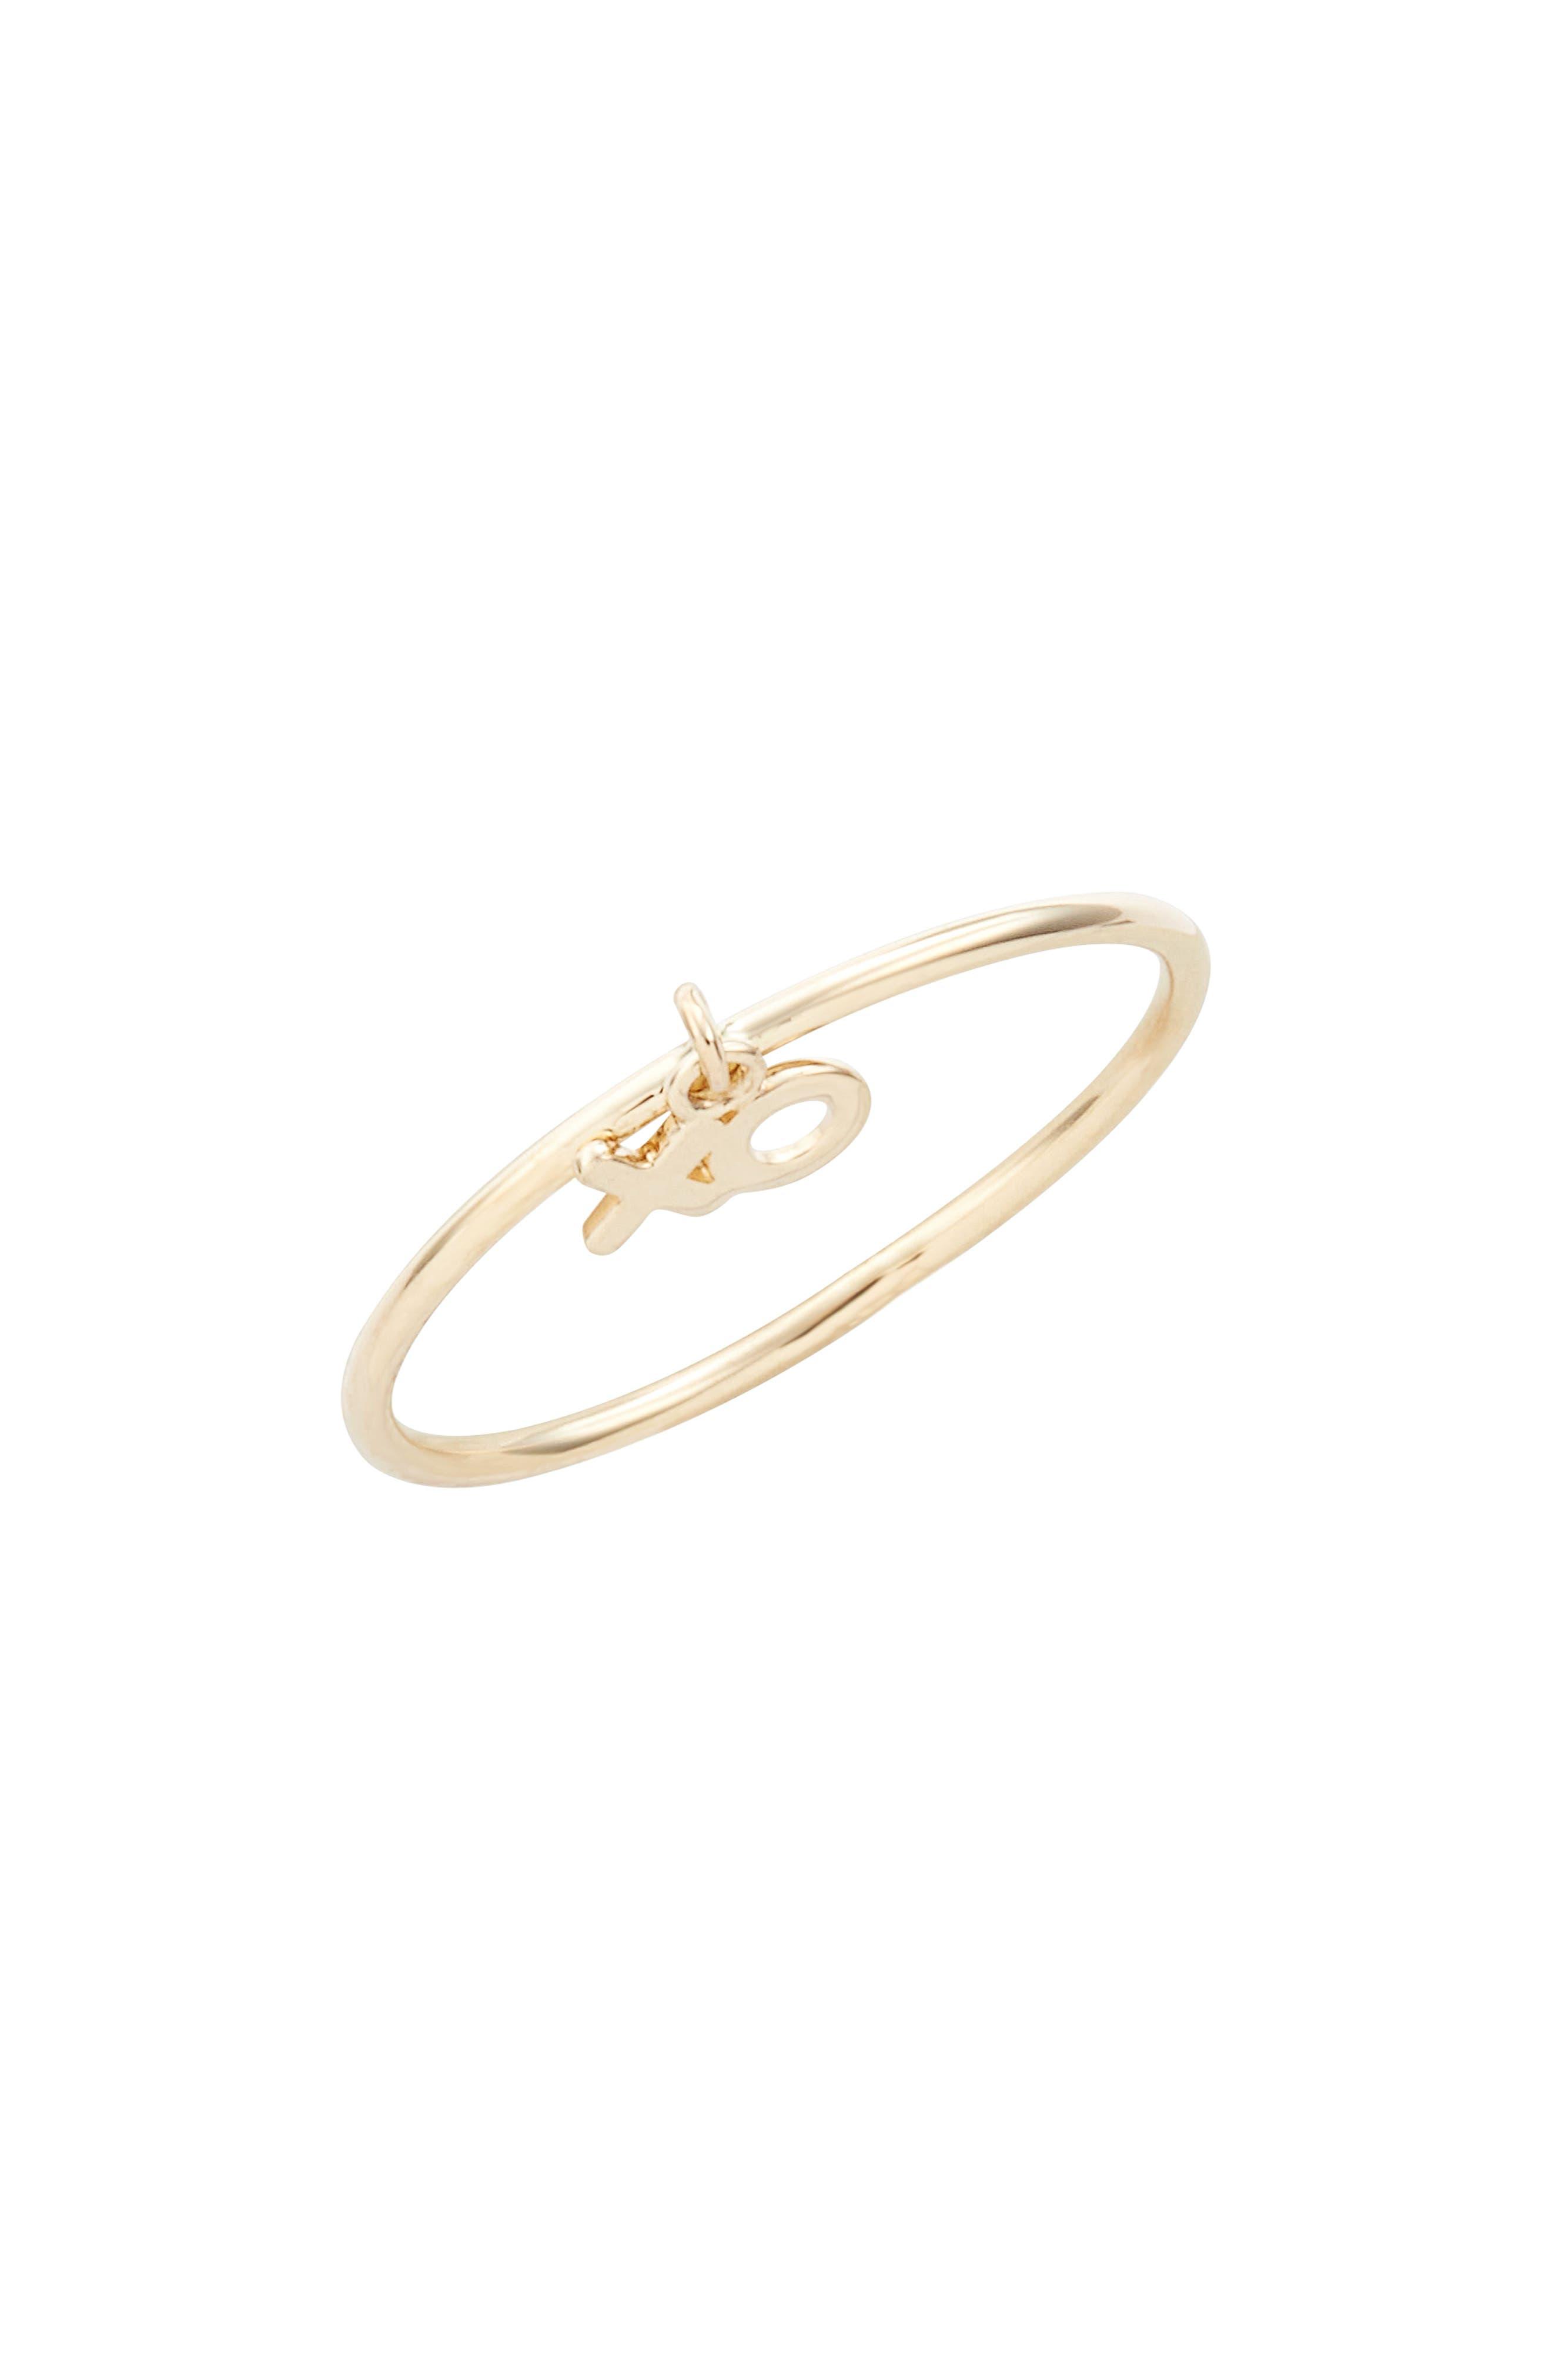 POPPY FINCH Skinny Dangling XO Charm Ring